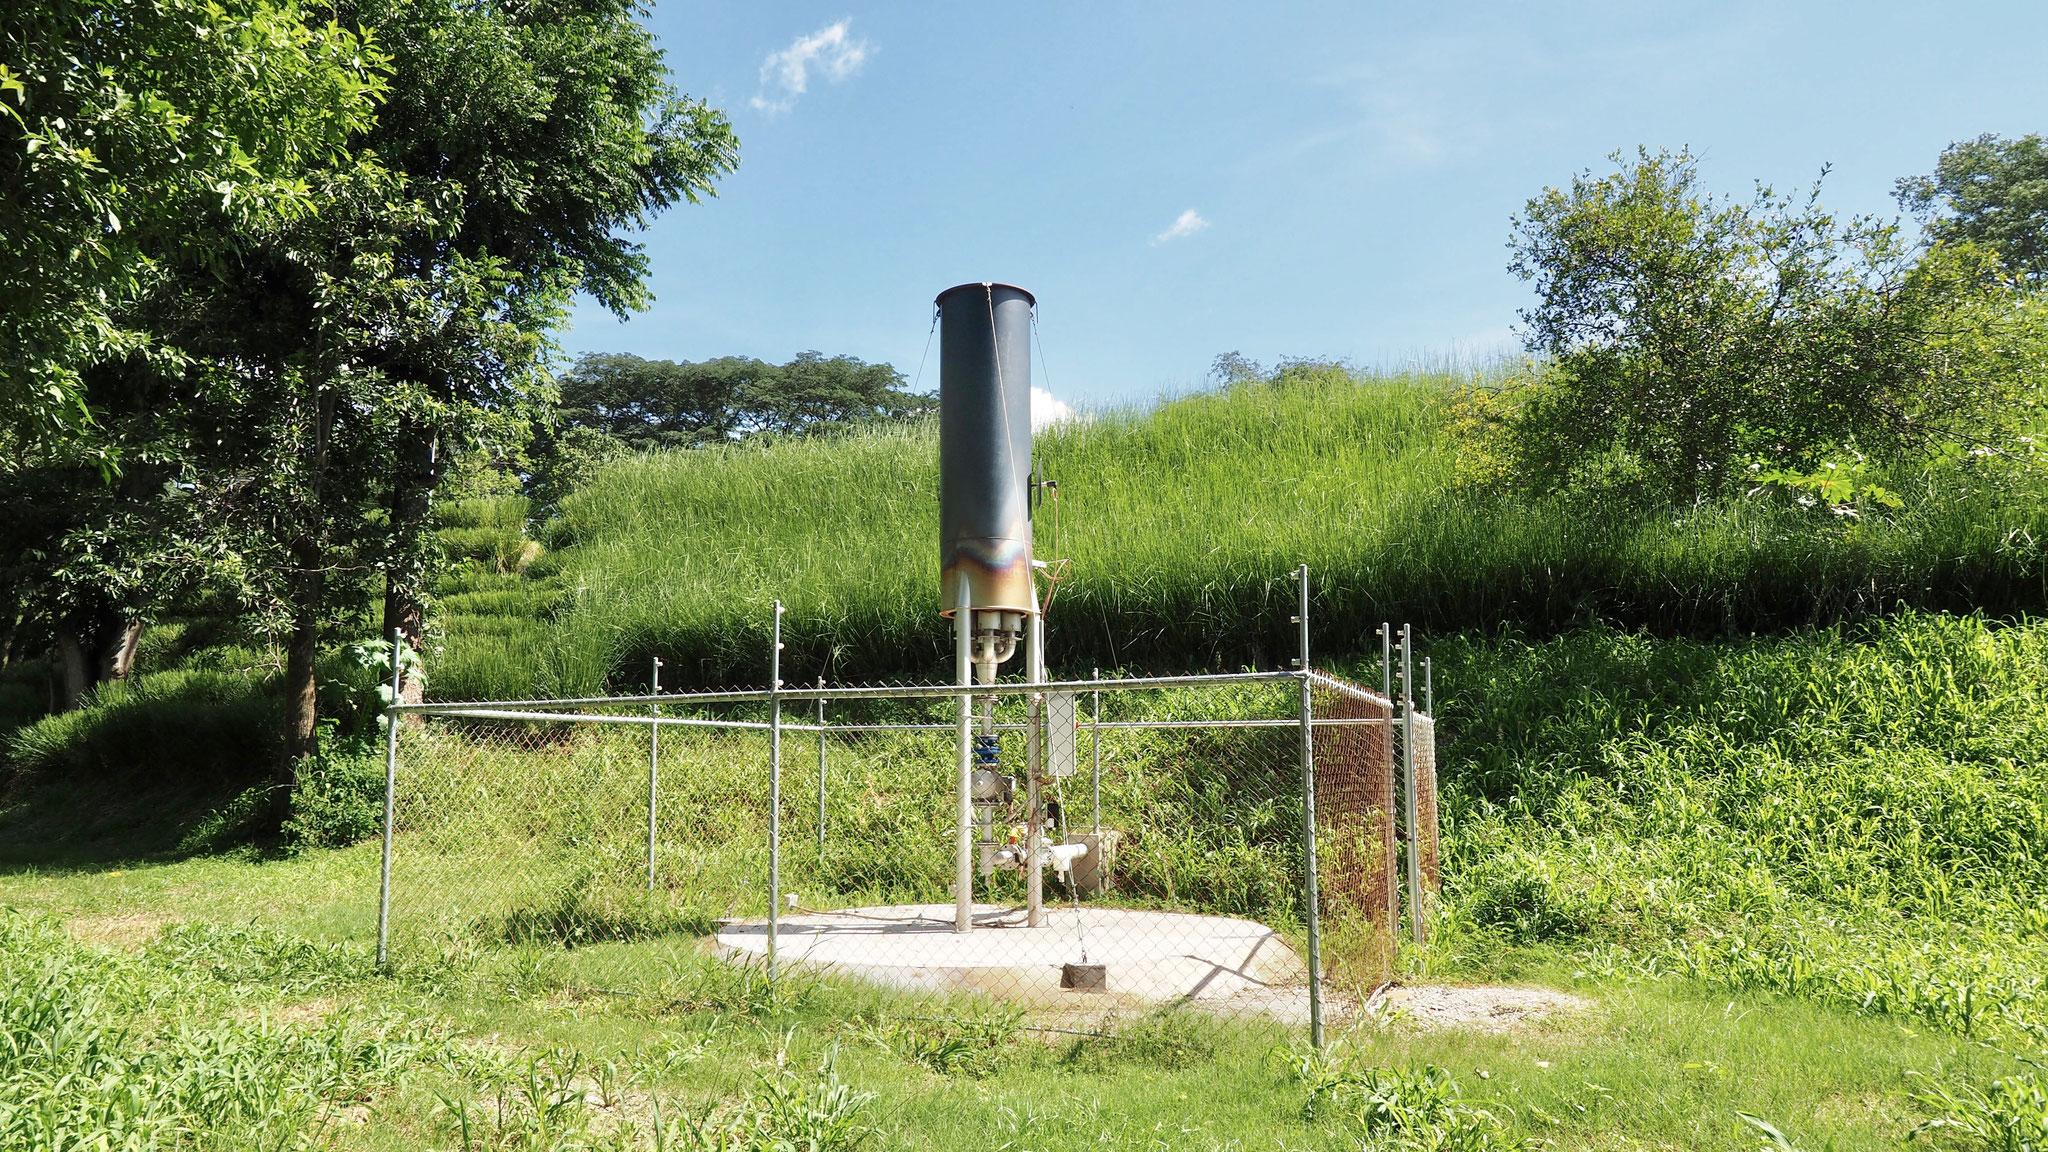 Antorcha biogas